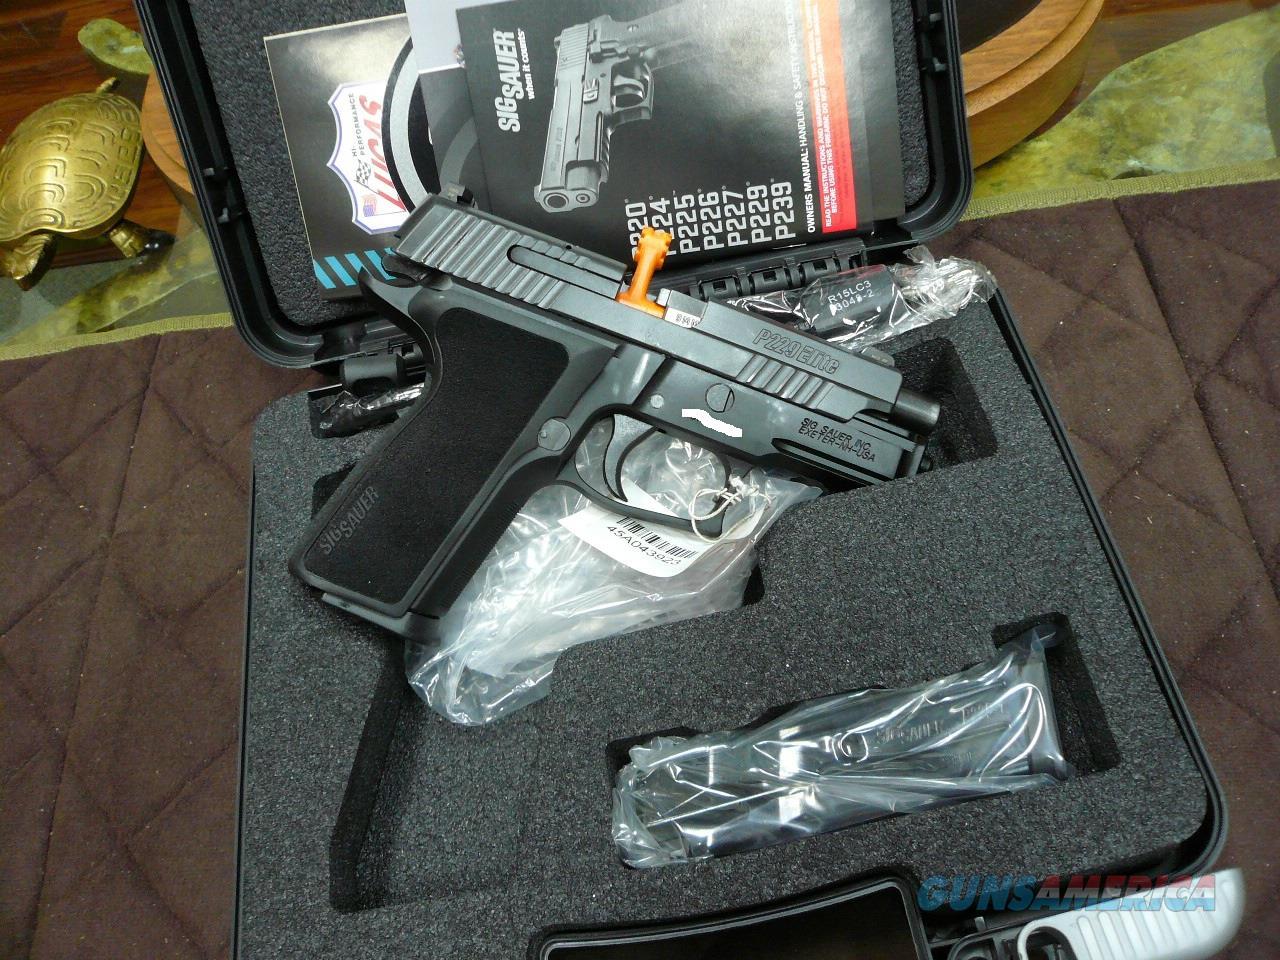 P229R / ELITE  9mm  NIB  Guns > Pistols > Sig - Sauer/Sigarms Pistols > P229